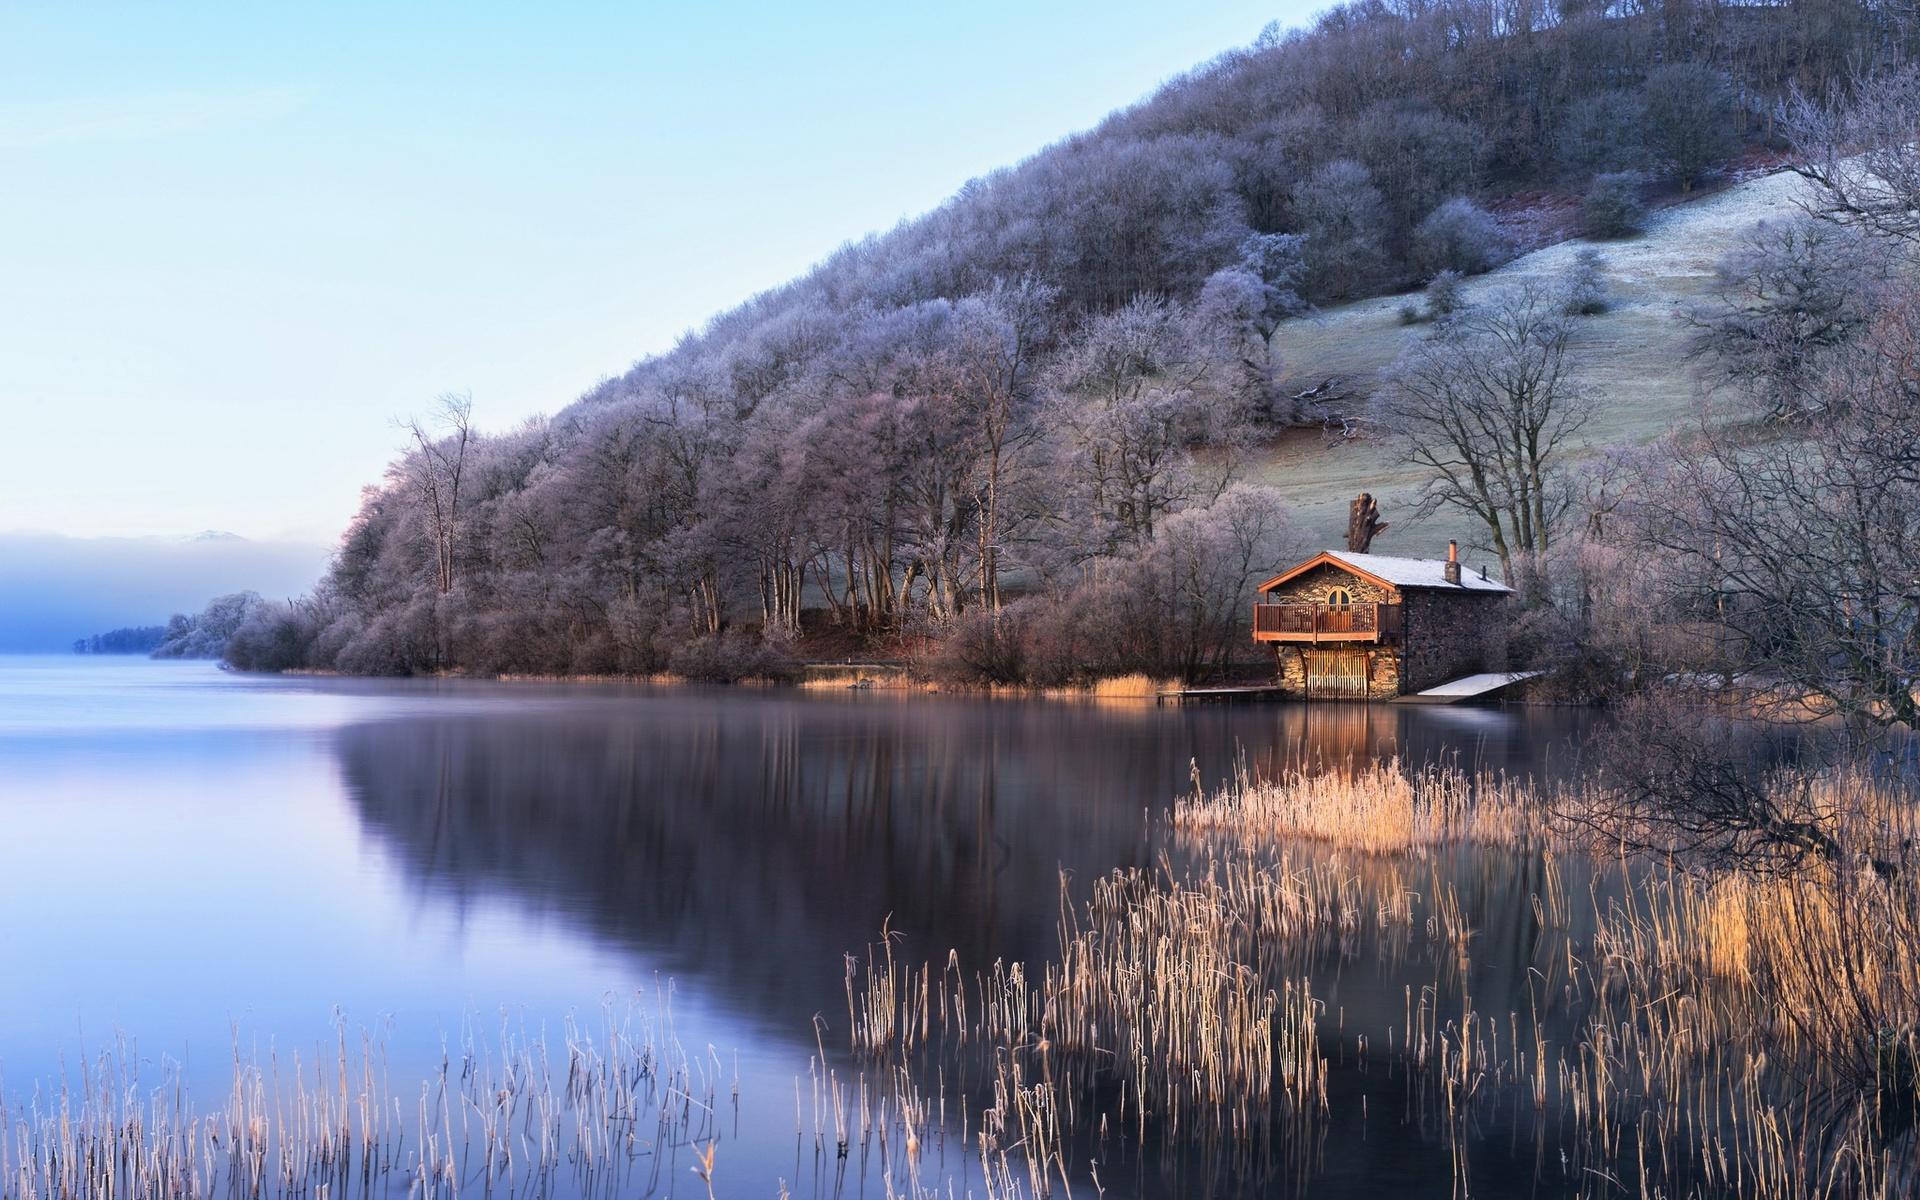 англия, природа, пейзаж, река, холм, деревья, трава, дом